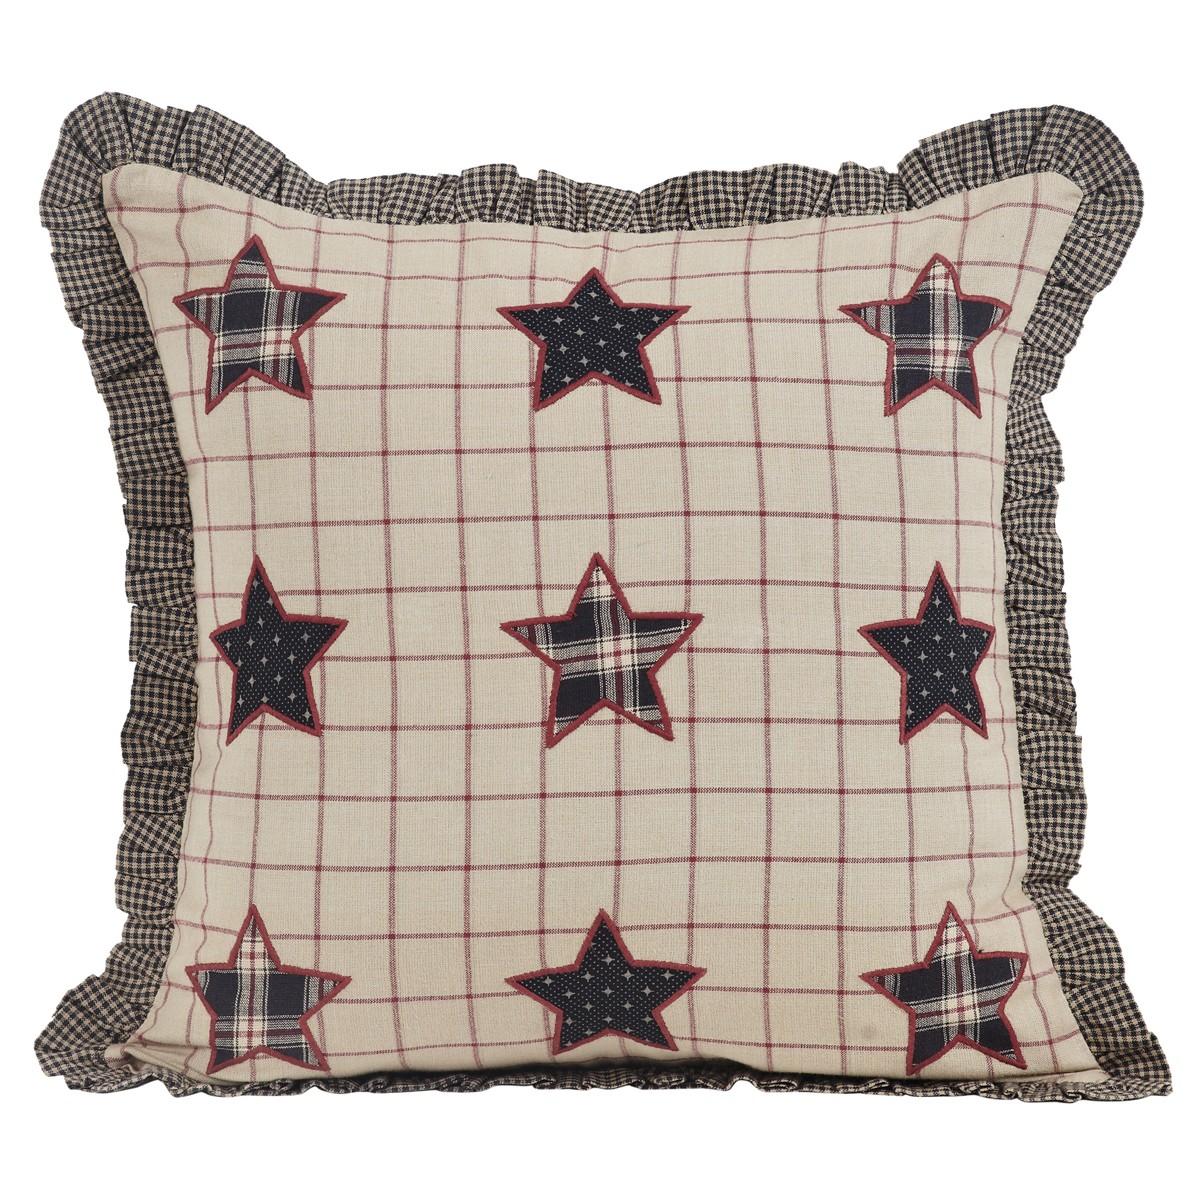 Bingham Star Fabric Pillow with Applique Stars 16x16